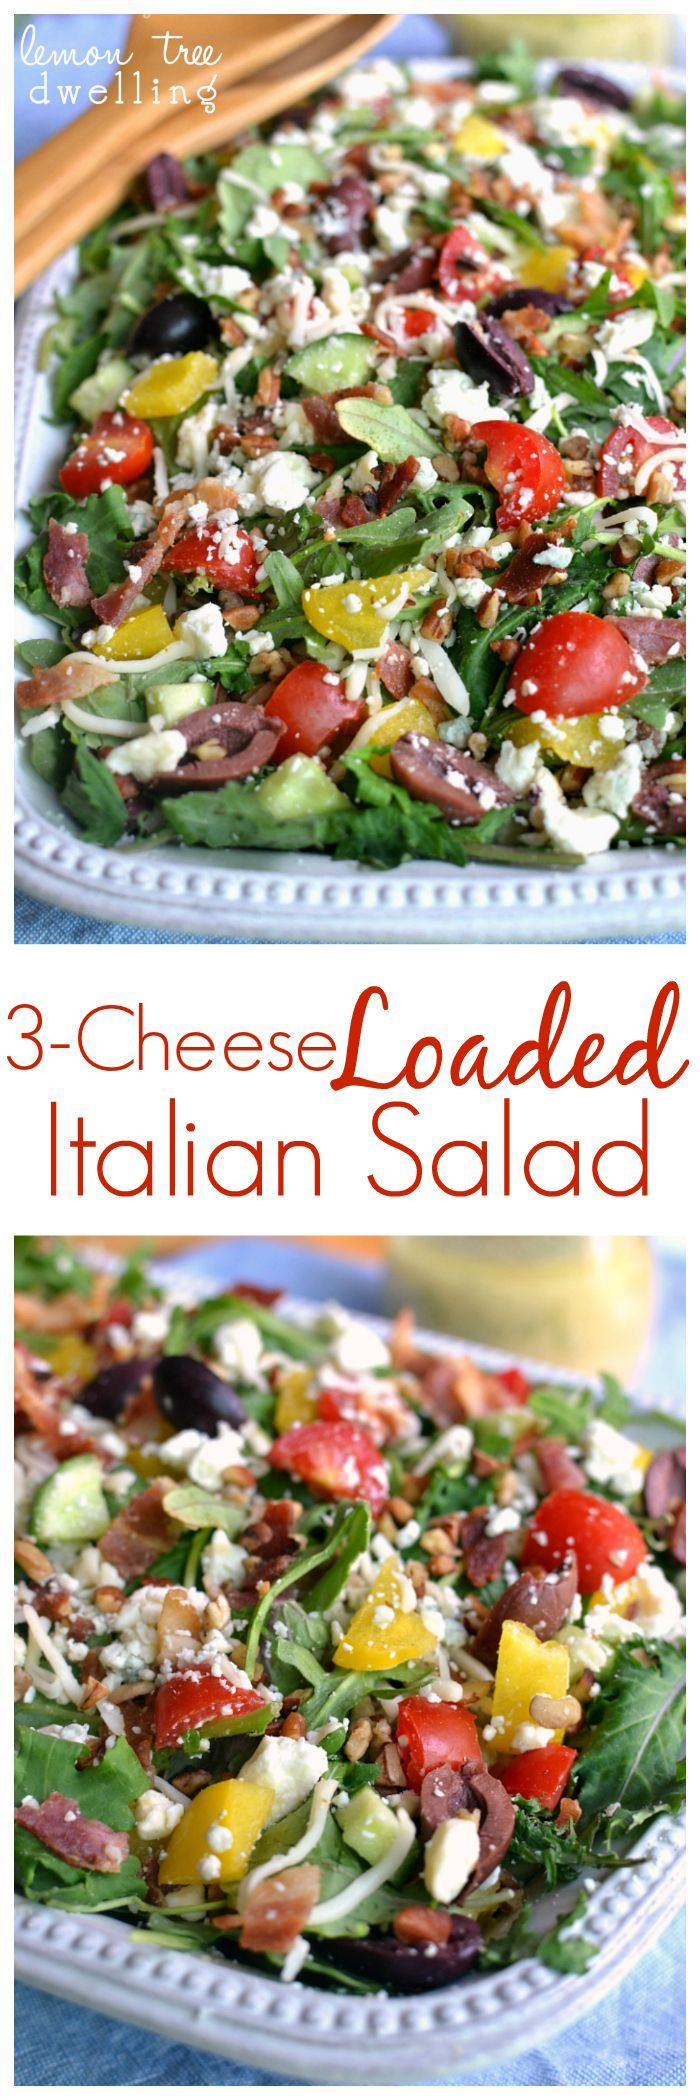 3-Cheese Loaded Italian Salad -made with Earthbound Farms Kale Italia #organicbound #sponsored @earthboundfarm